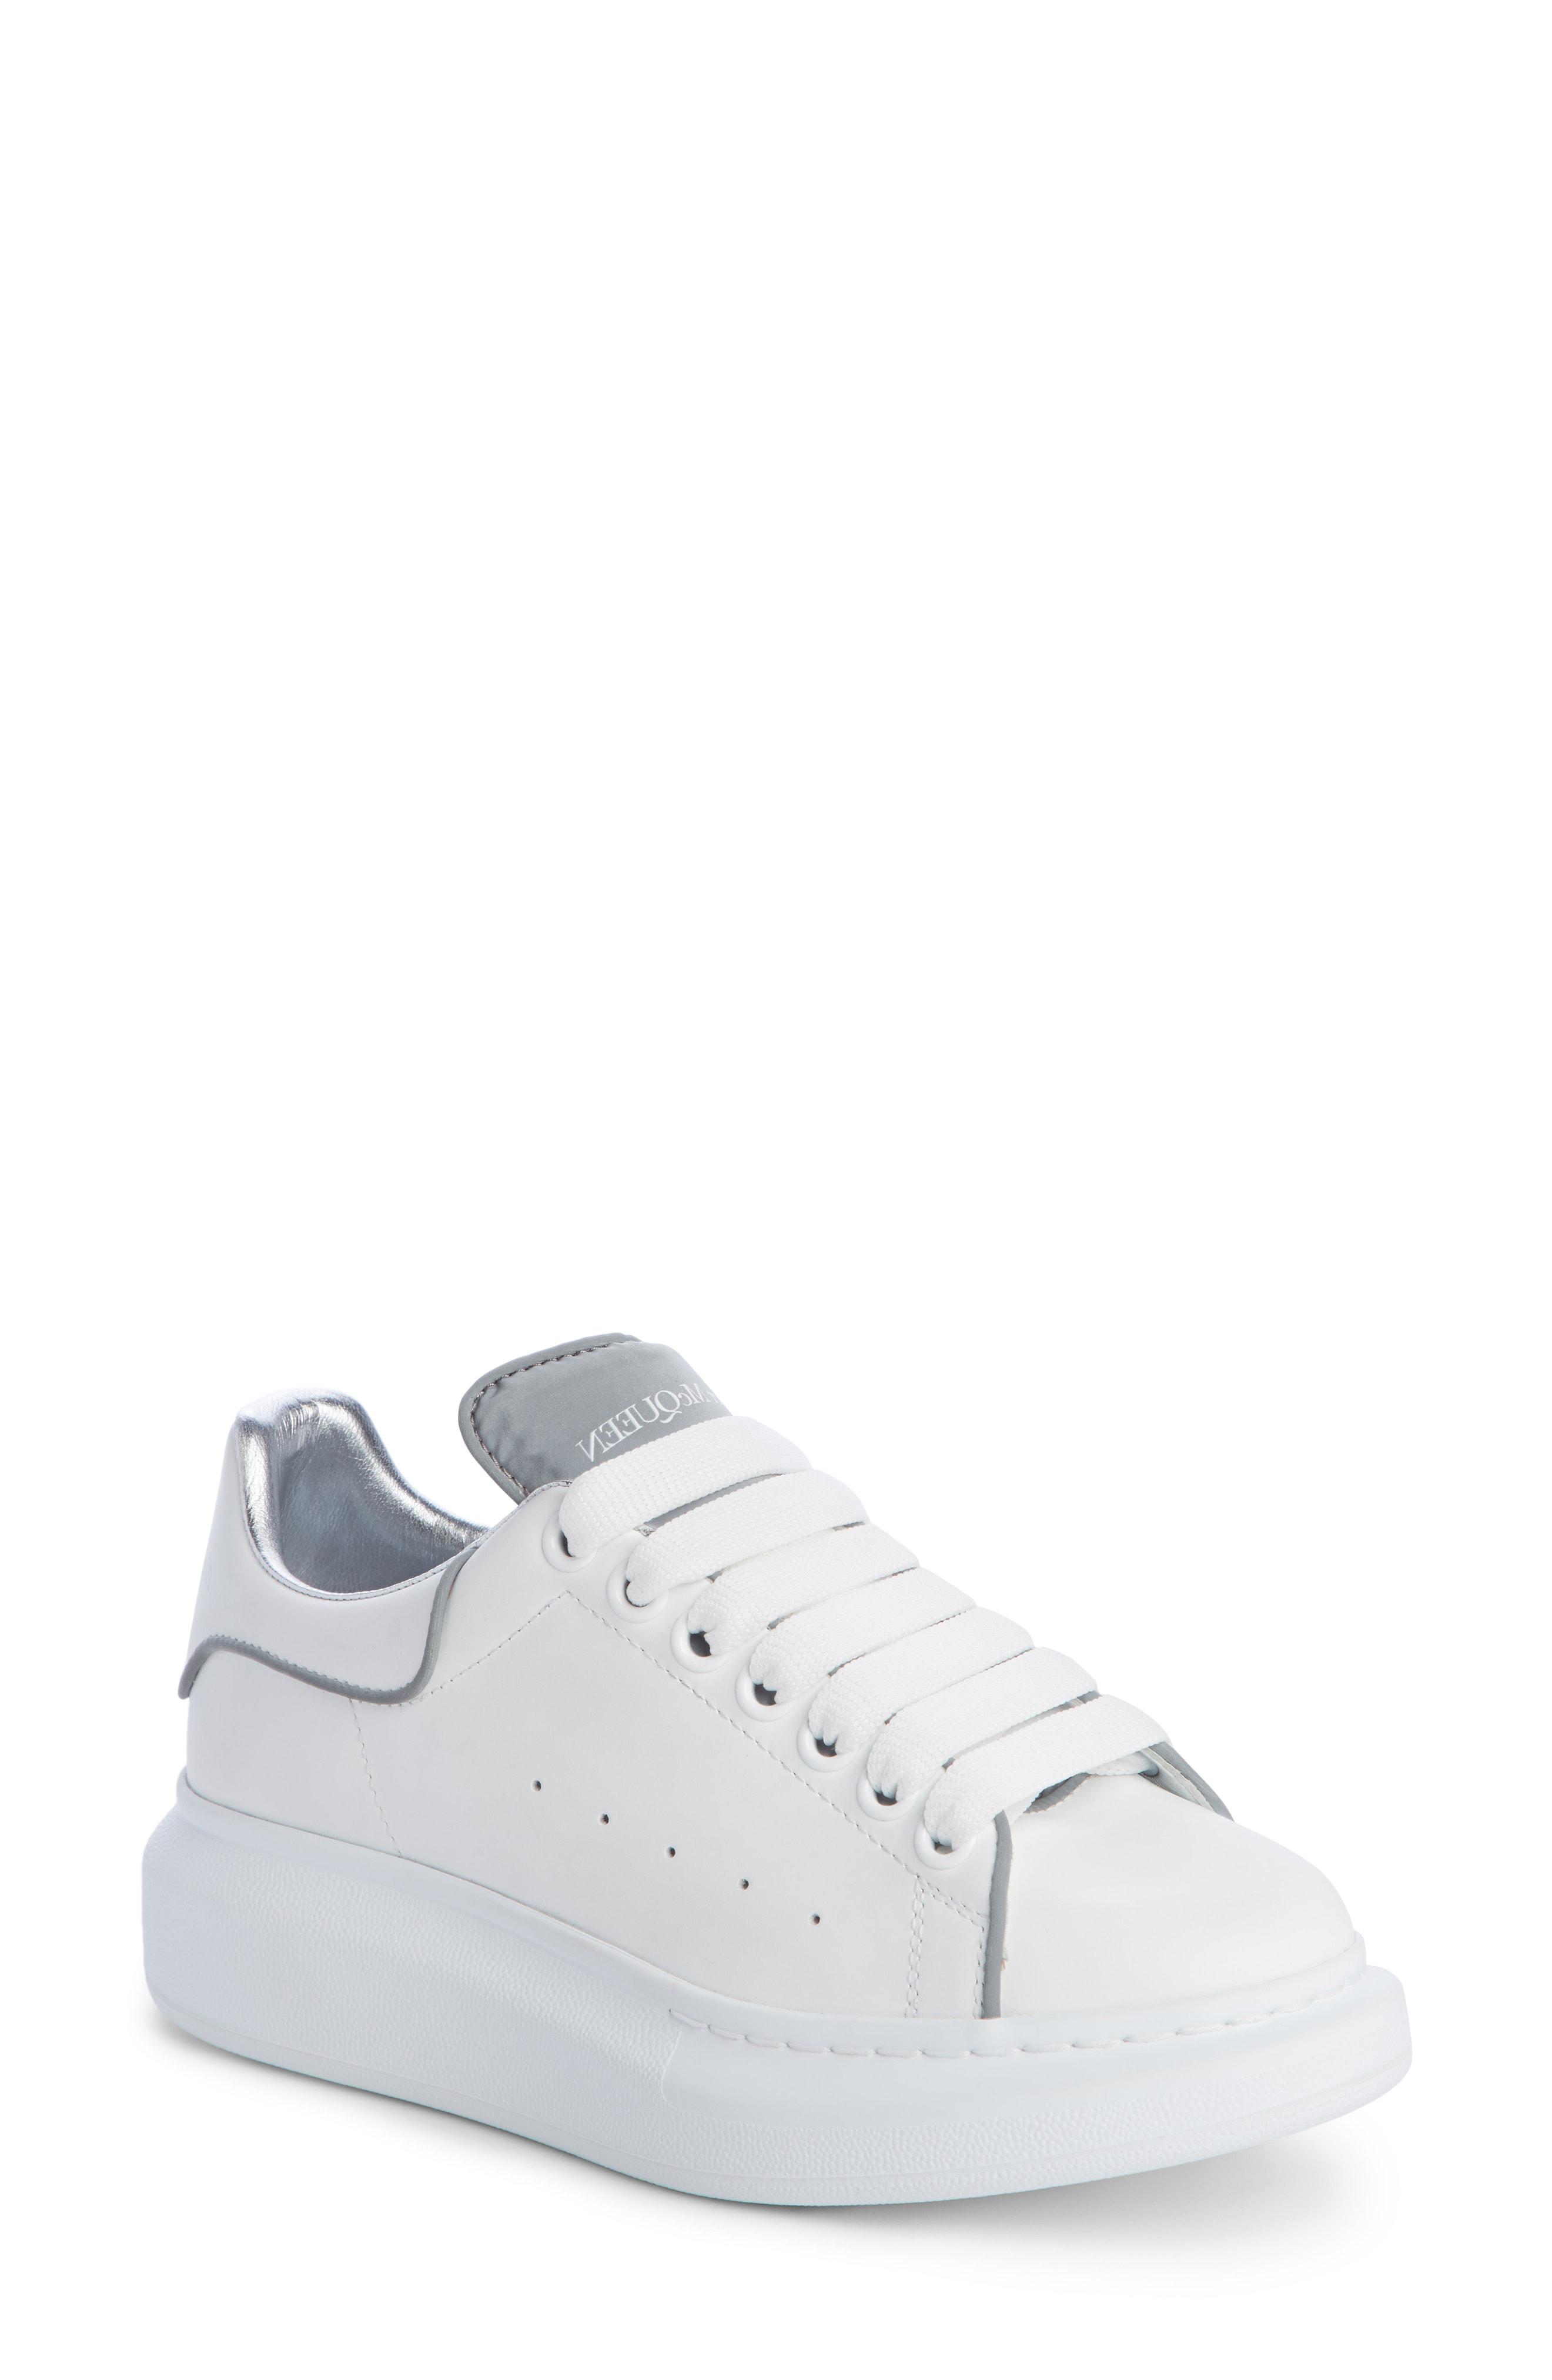 57eaa78f9b21 Alexander Mcqueen Sneaker In White  Silver Piping